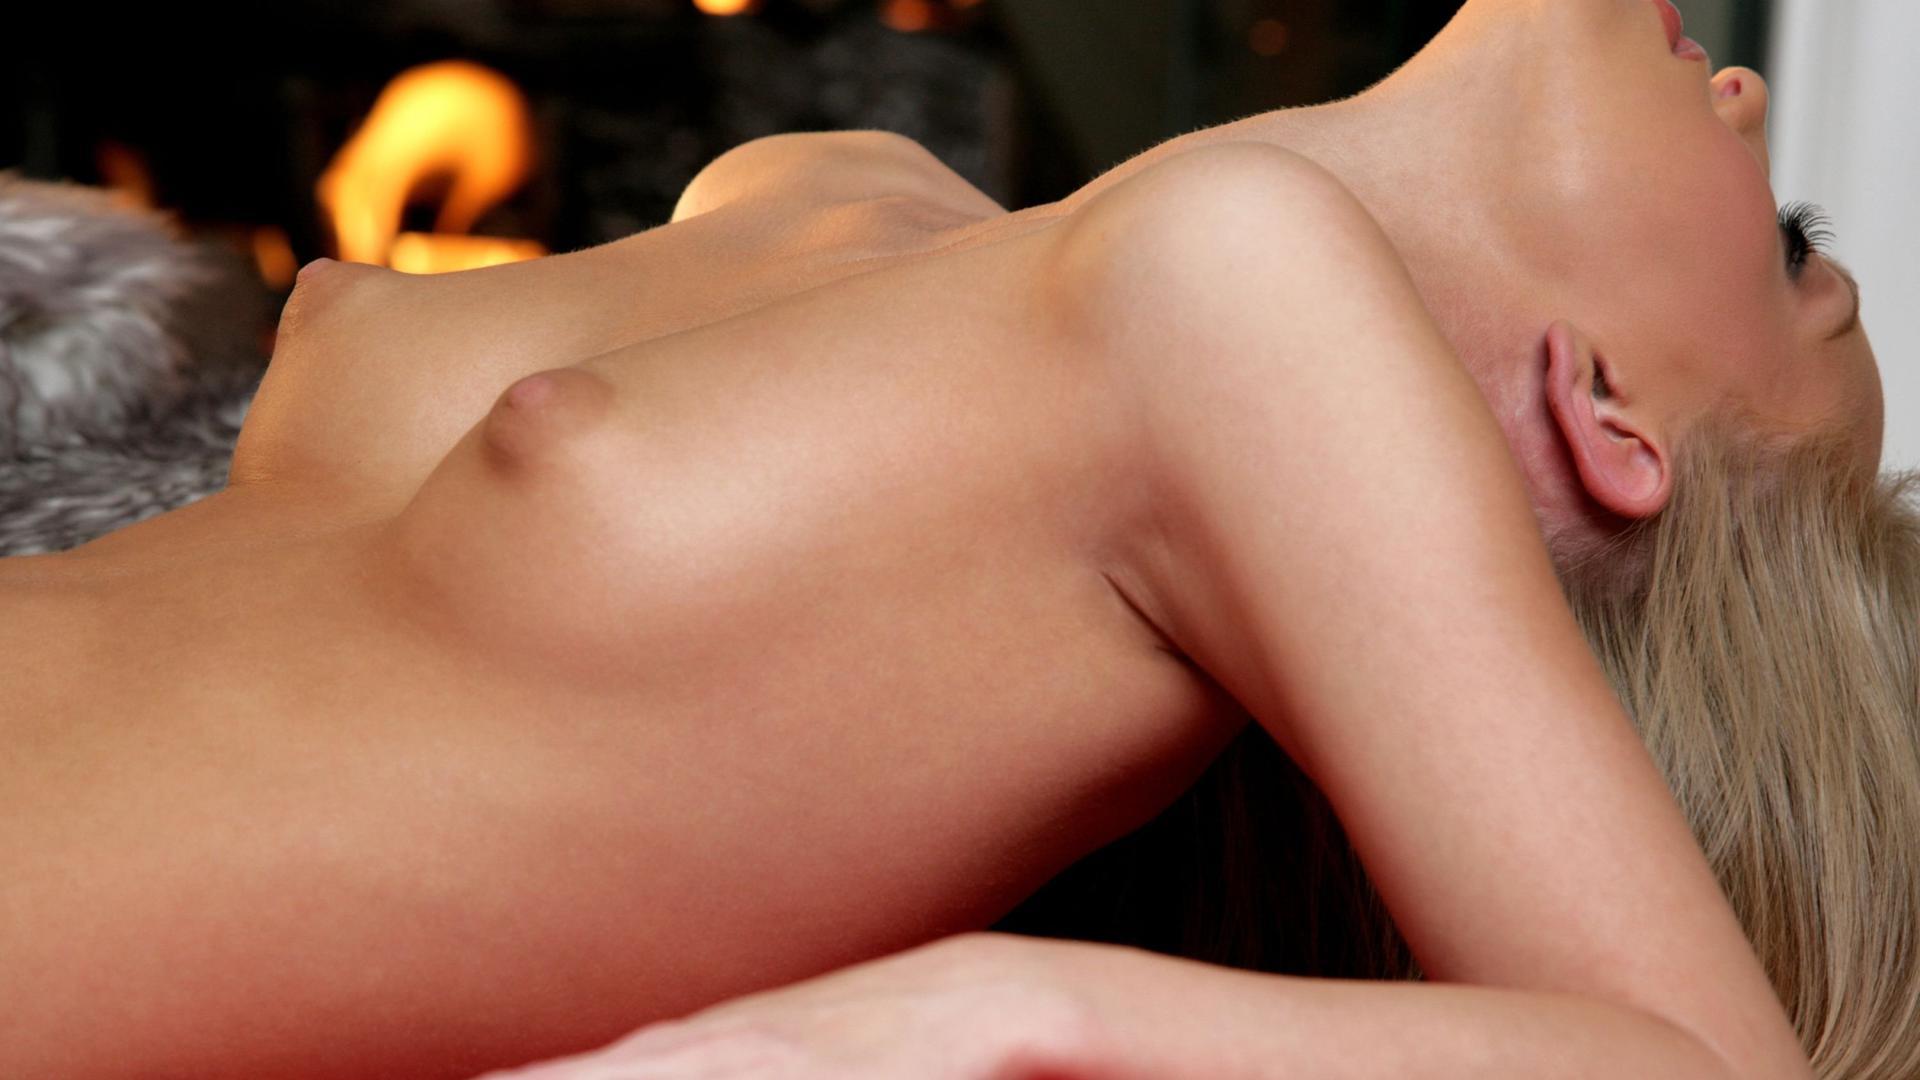 Download photo 1920x1080, brea bennett, blonde, nude, hot ...